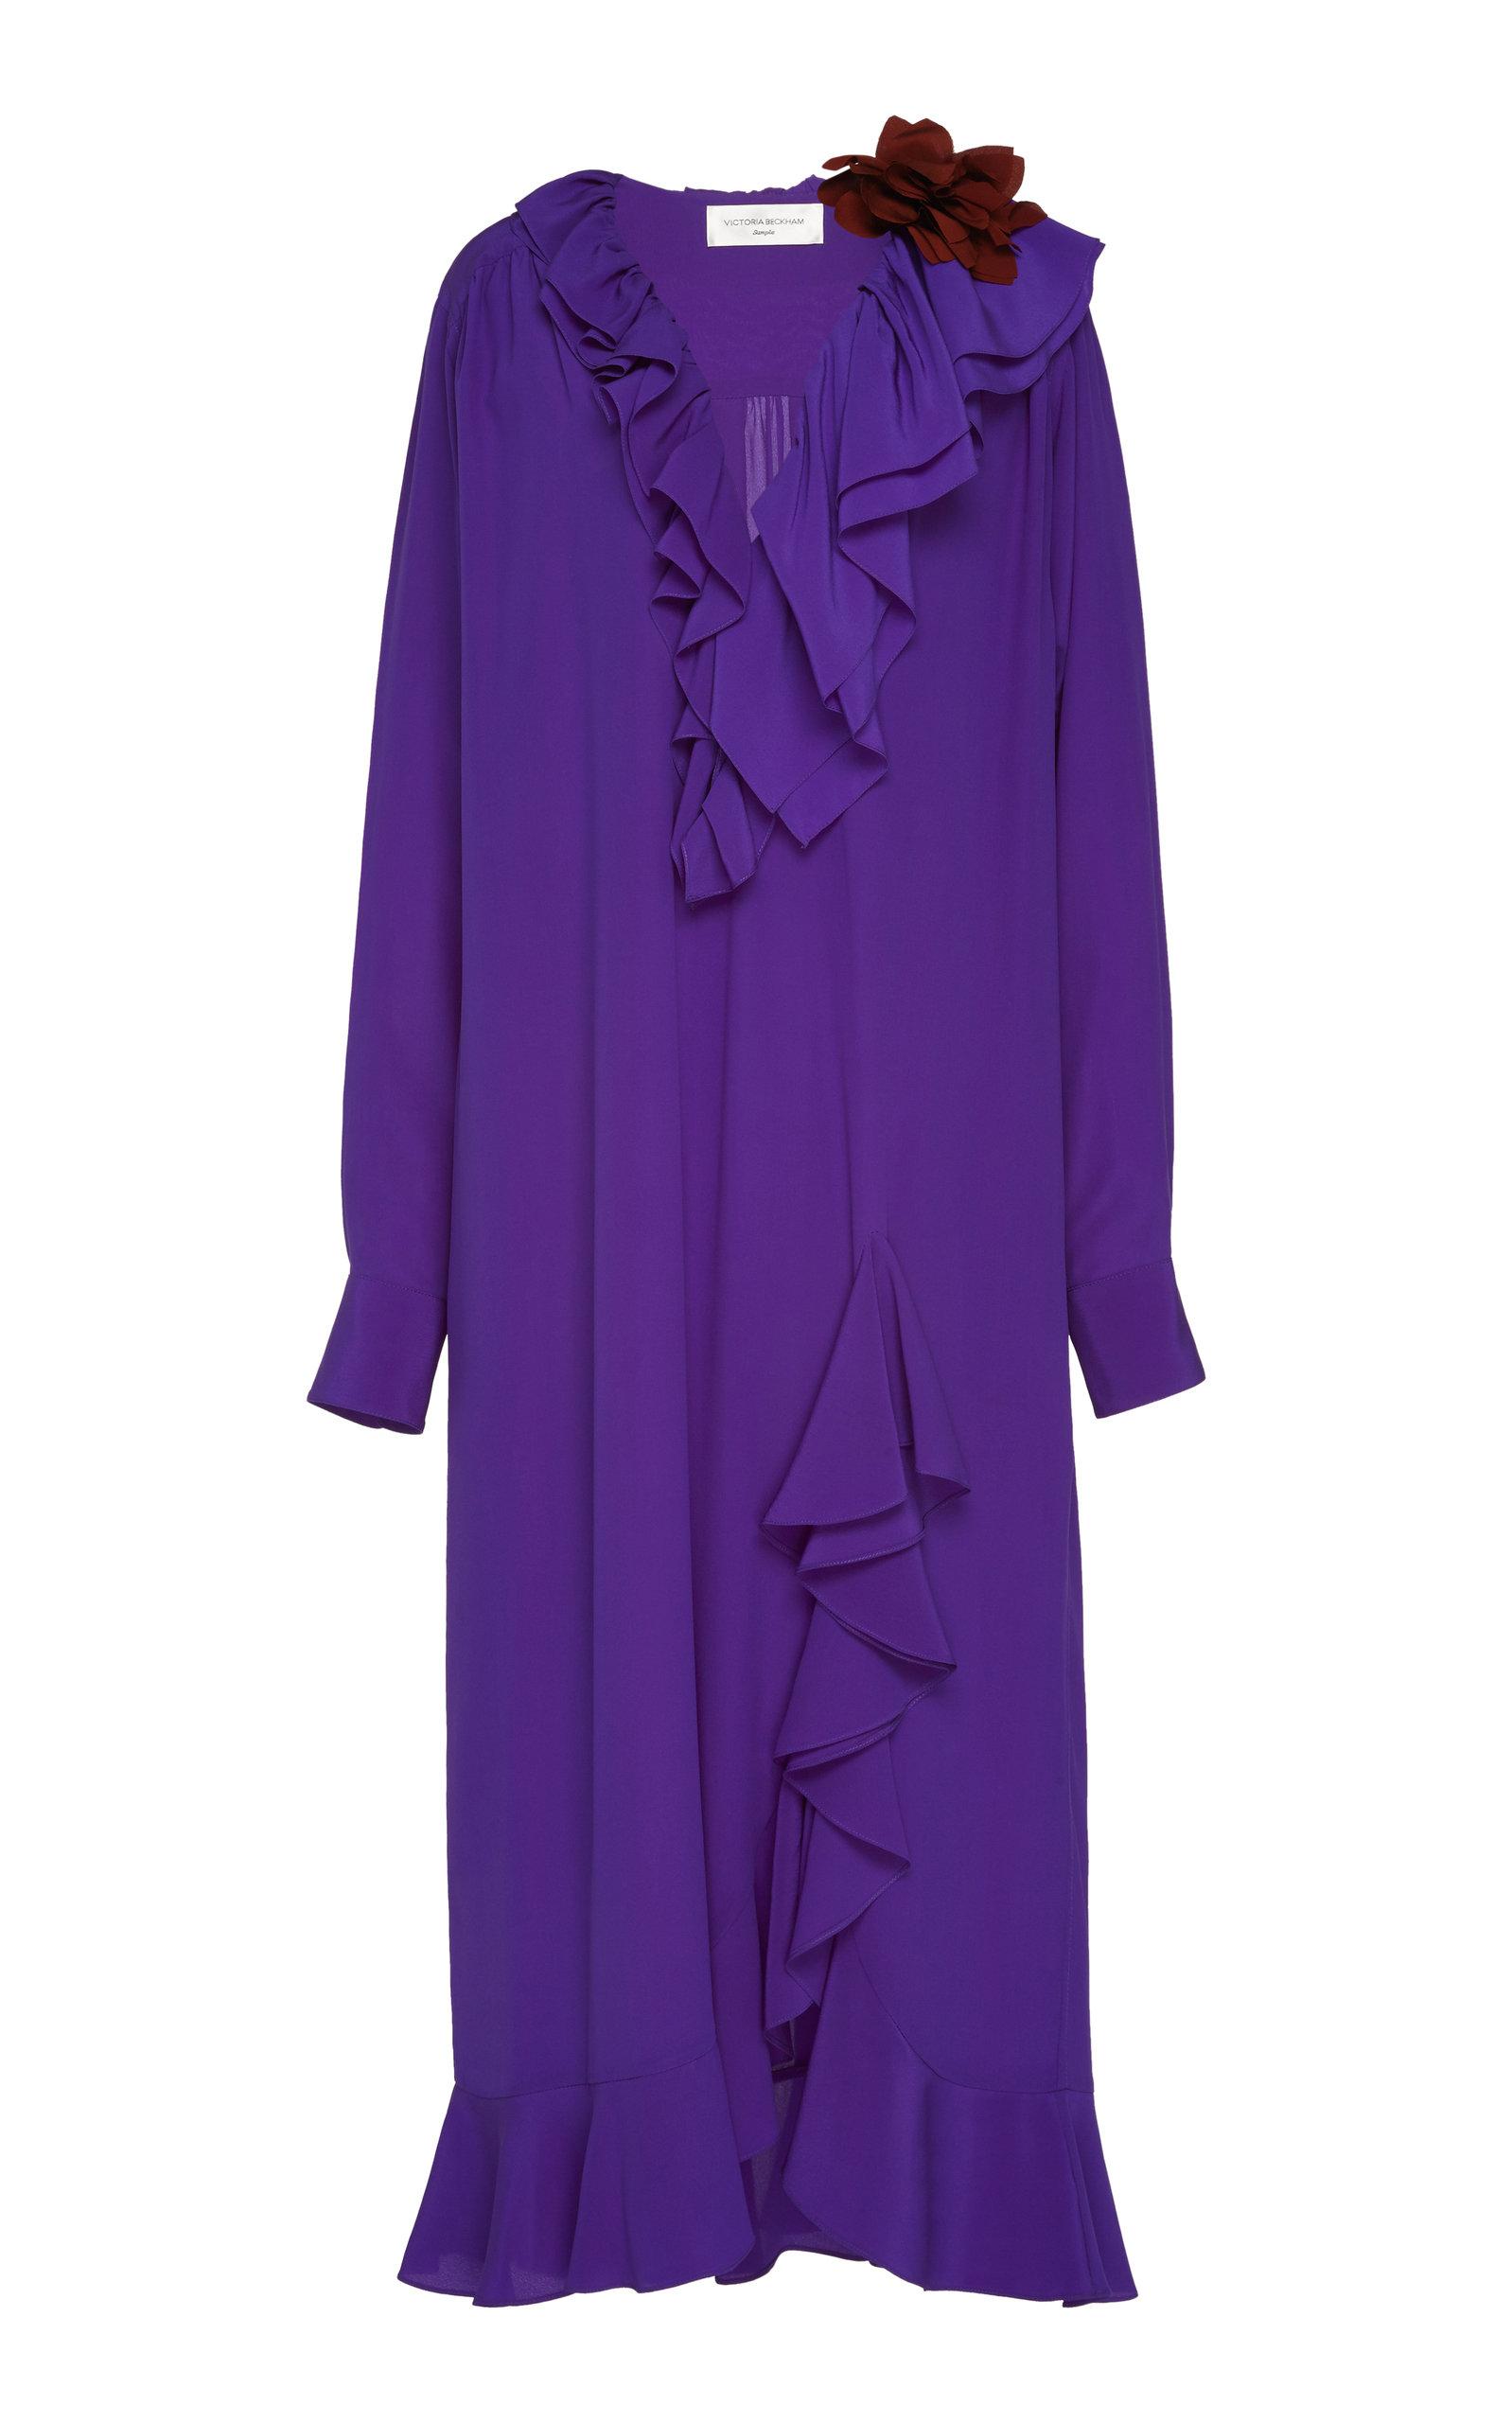 Buy Victoria Beckham Ruffled Silk Shirt Dress online, shop Victoria Beckham at the best price